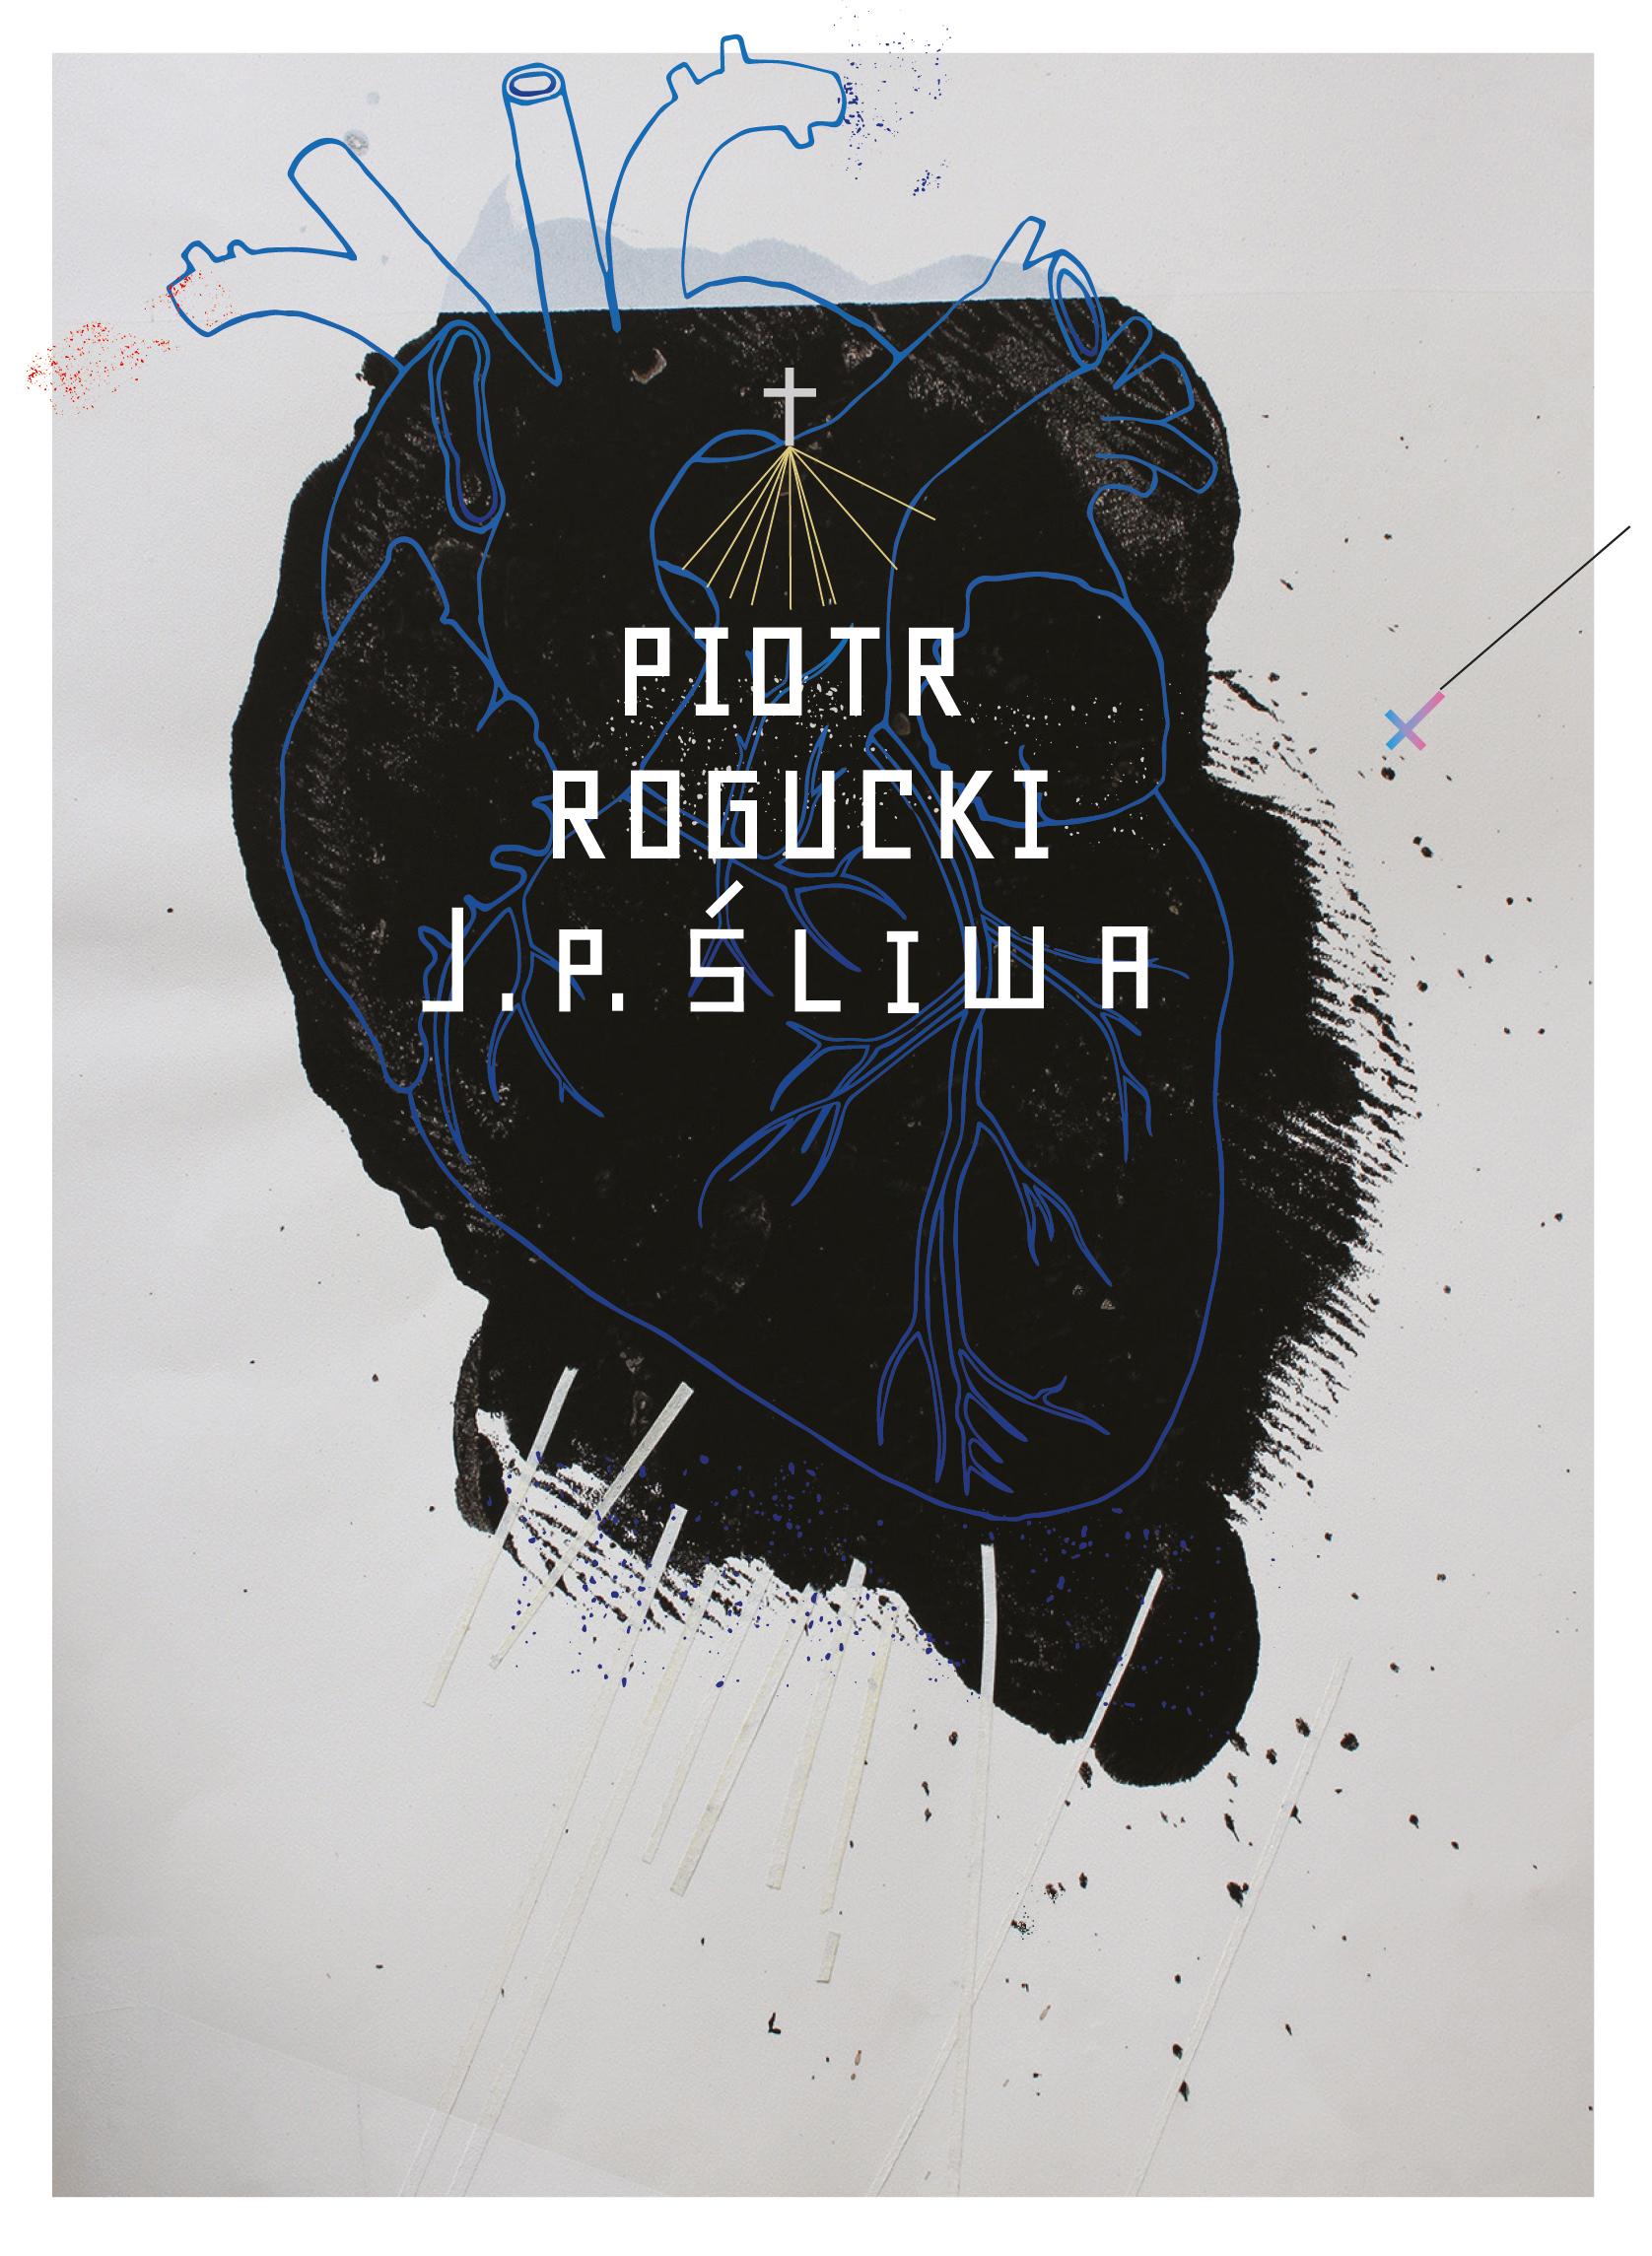 OKLADKA J.P. ŚLIWA PIOTR ROGUCKI